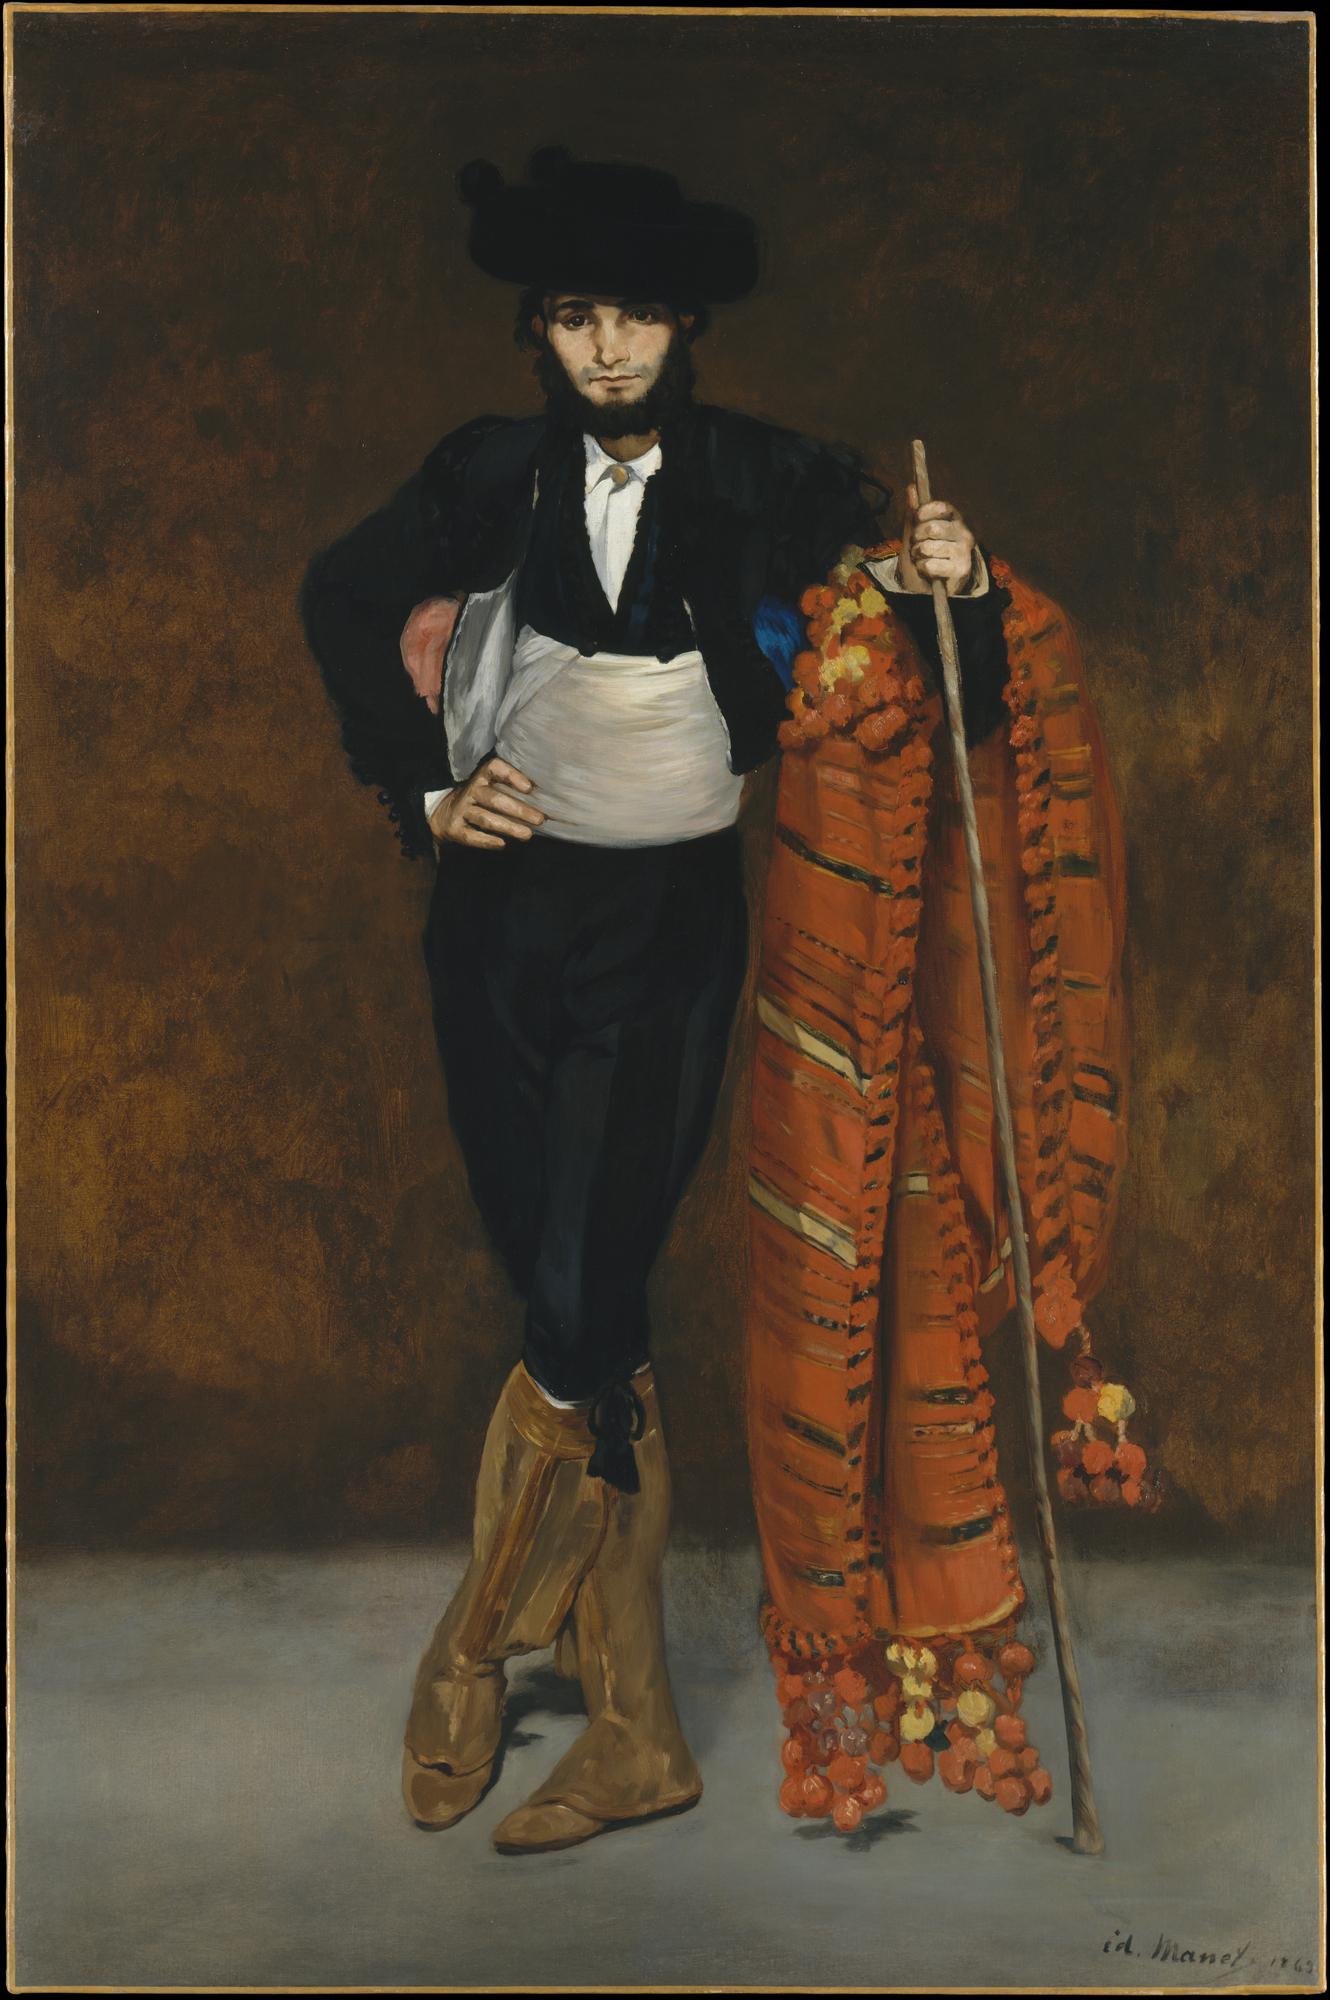 https://upload.wikimedia.org/wikipedia/commons/5/5c/Edouard_Manet_082.jpg